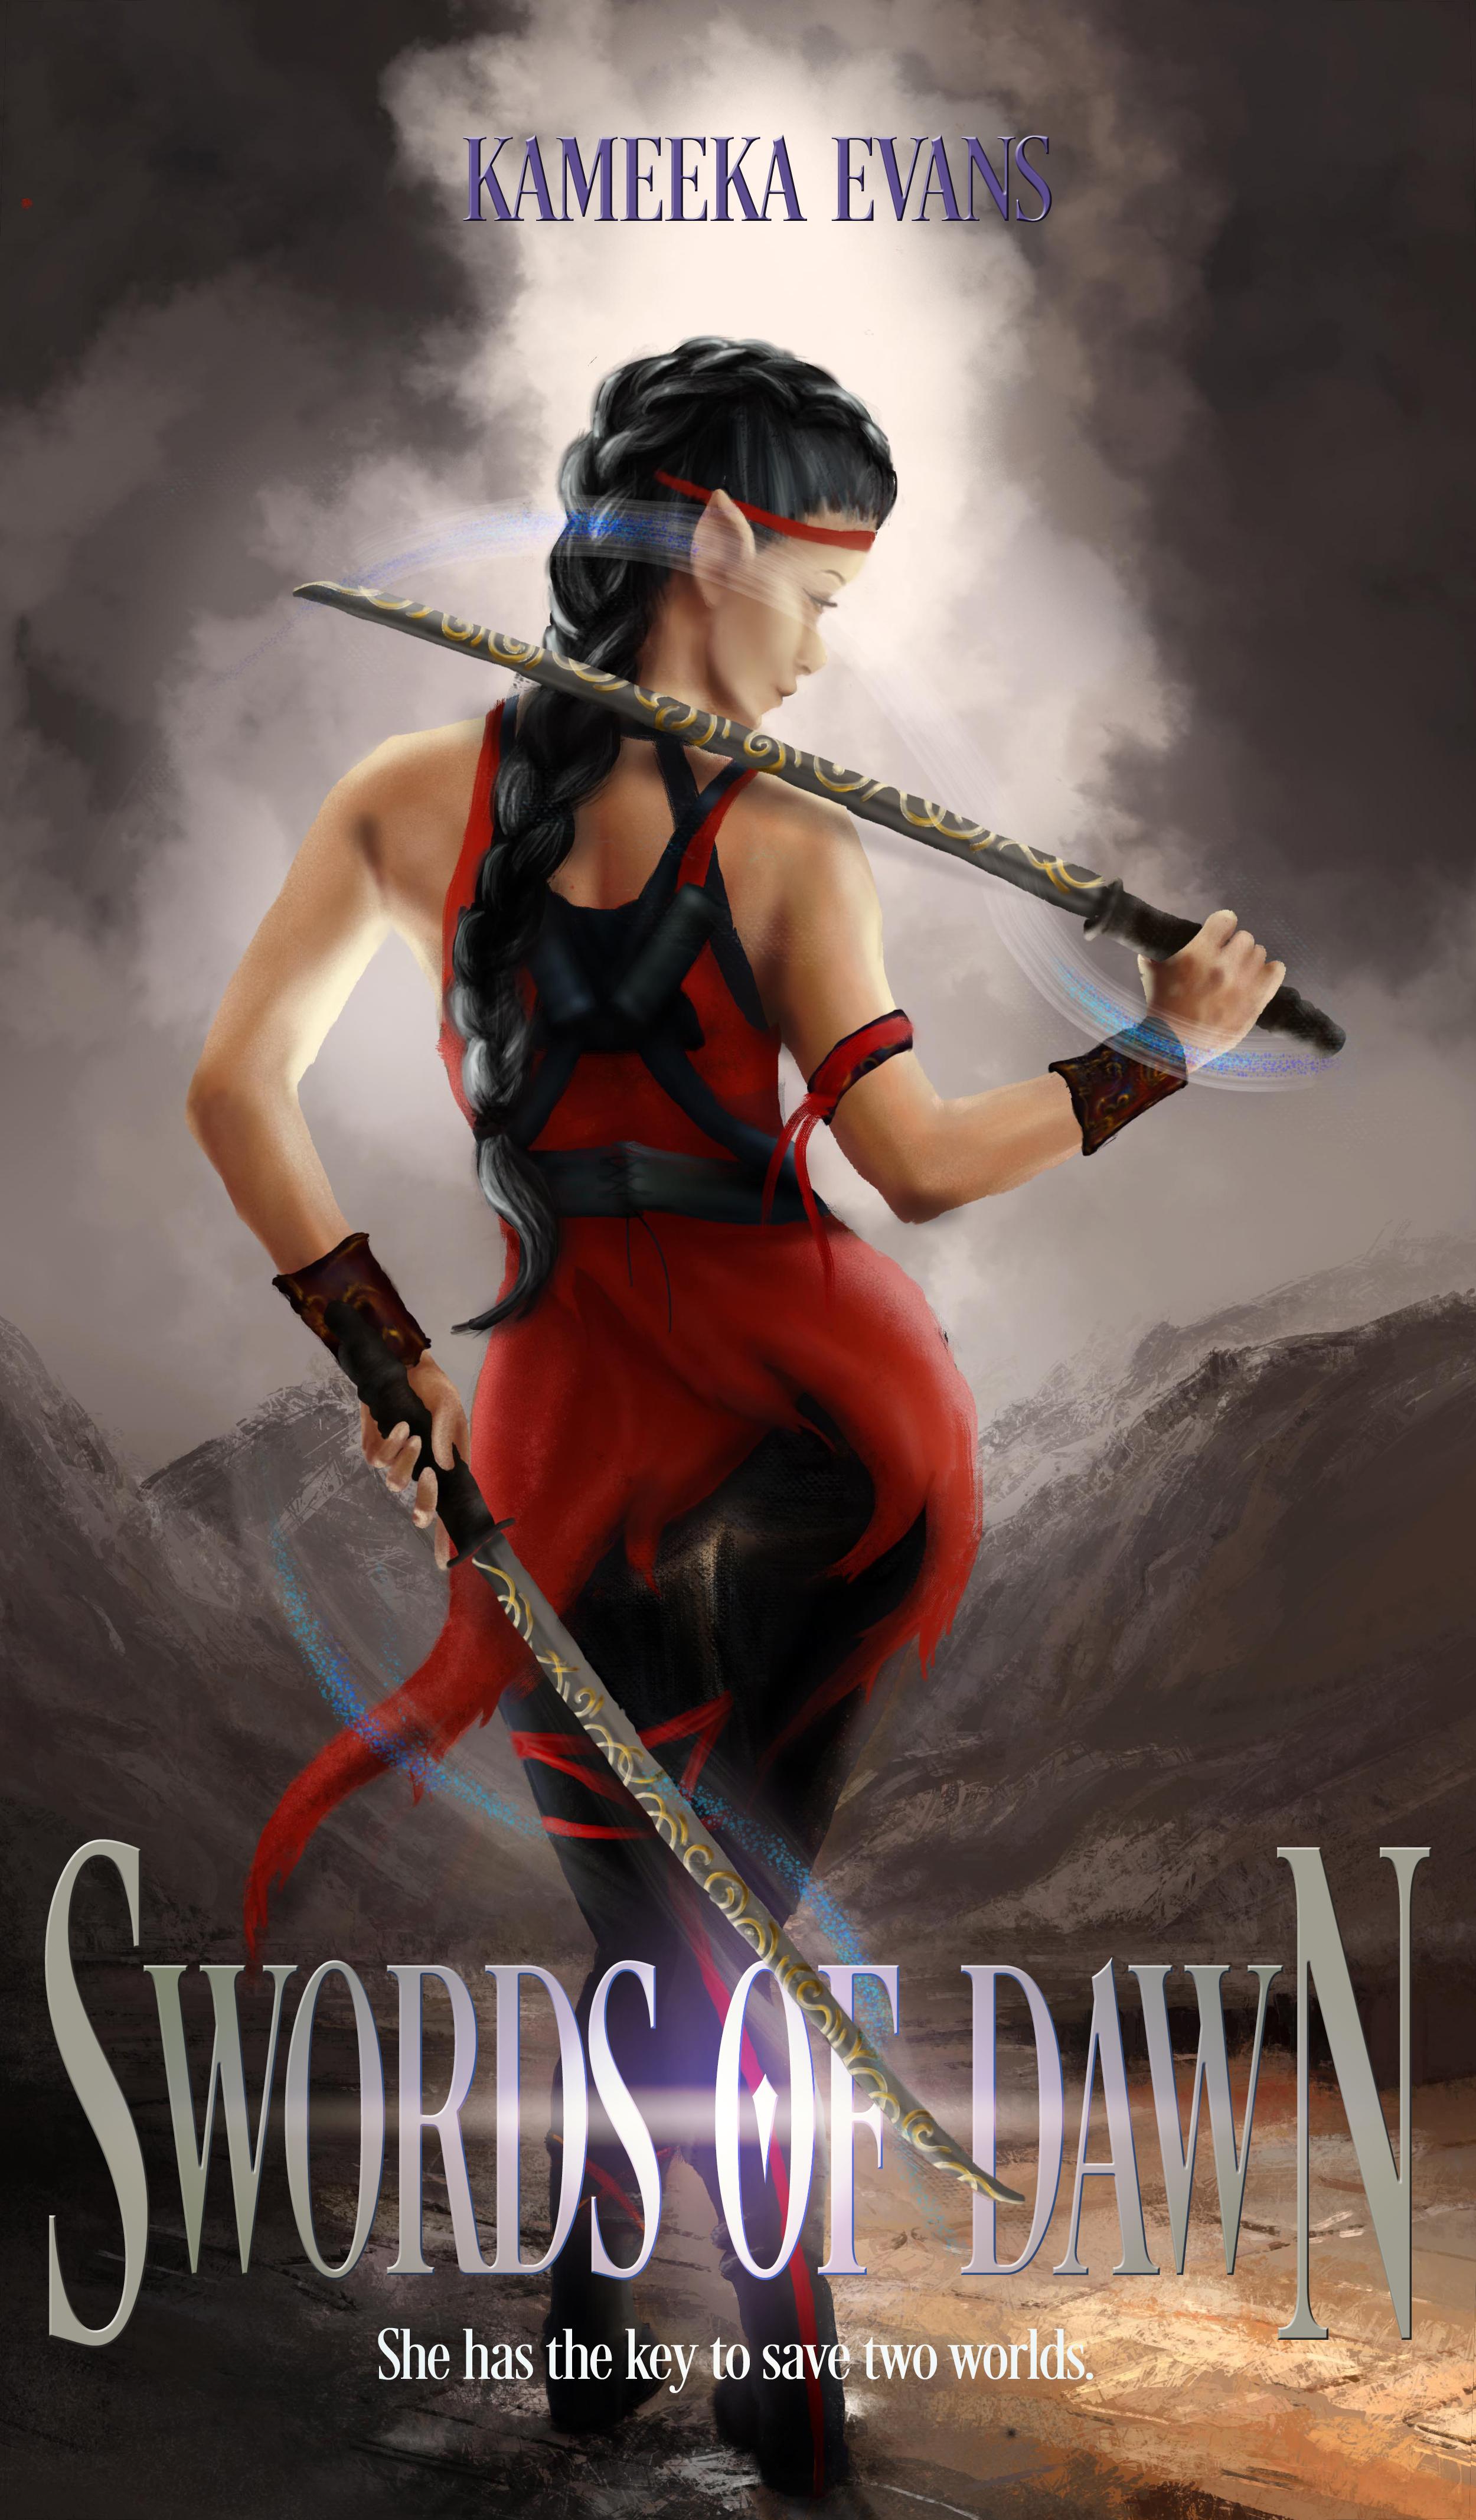 Swords of Dawn